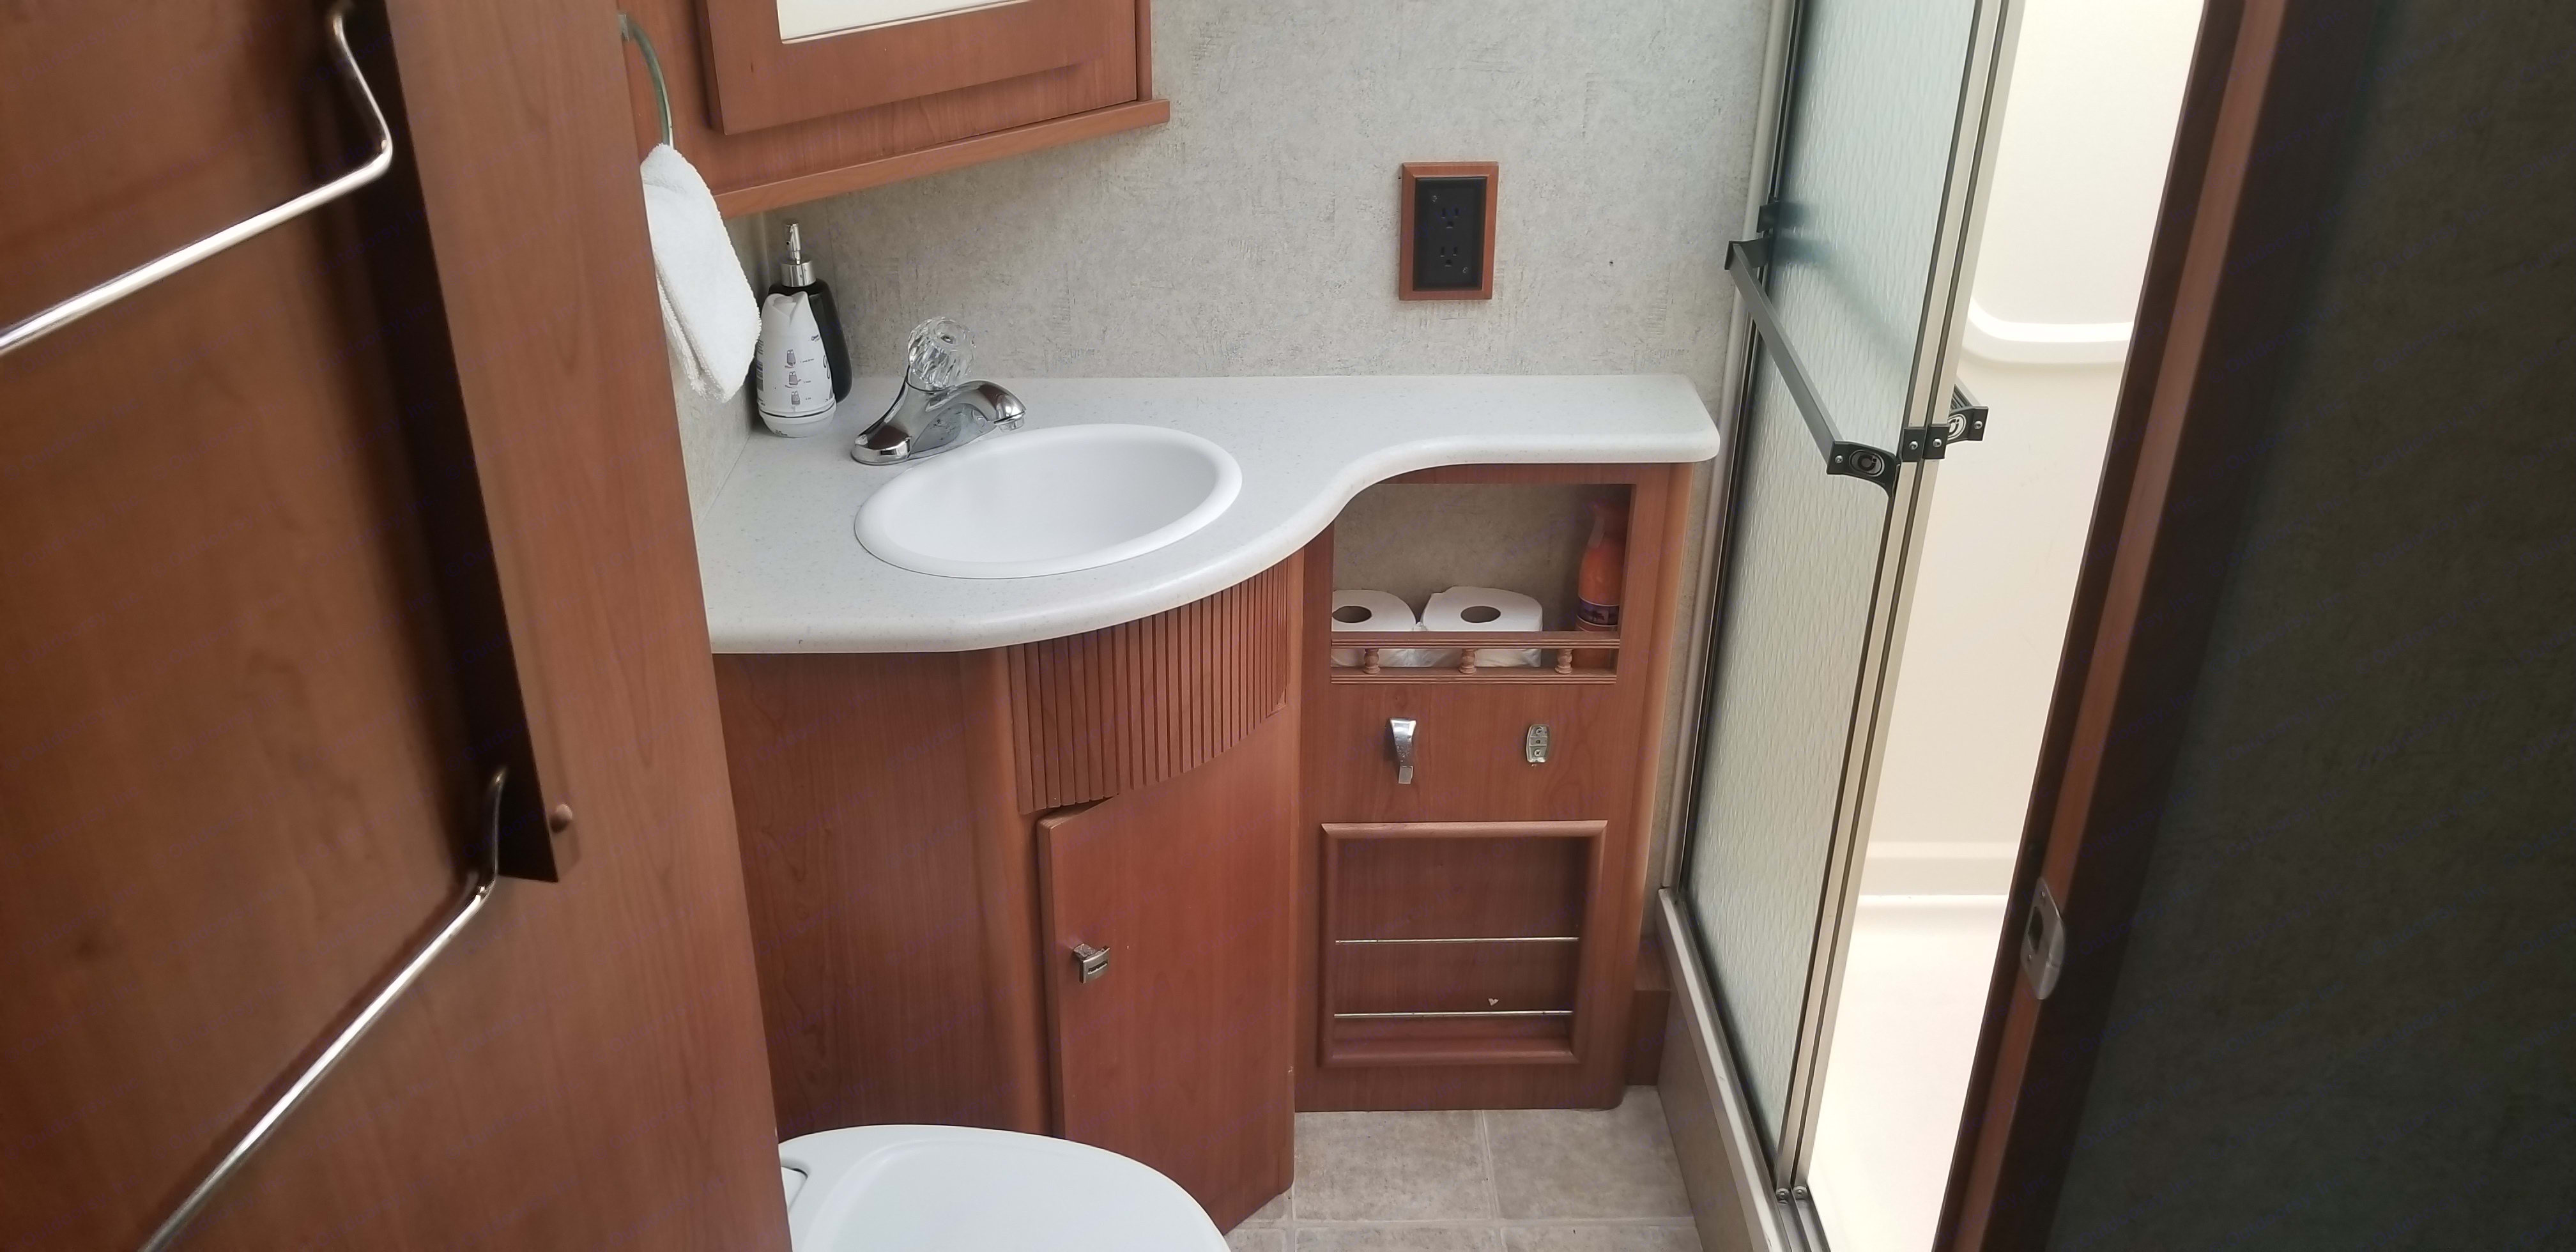 Full size bathroom with glass door walk in shower. Winnebago Sightseer 2008